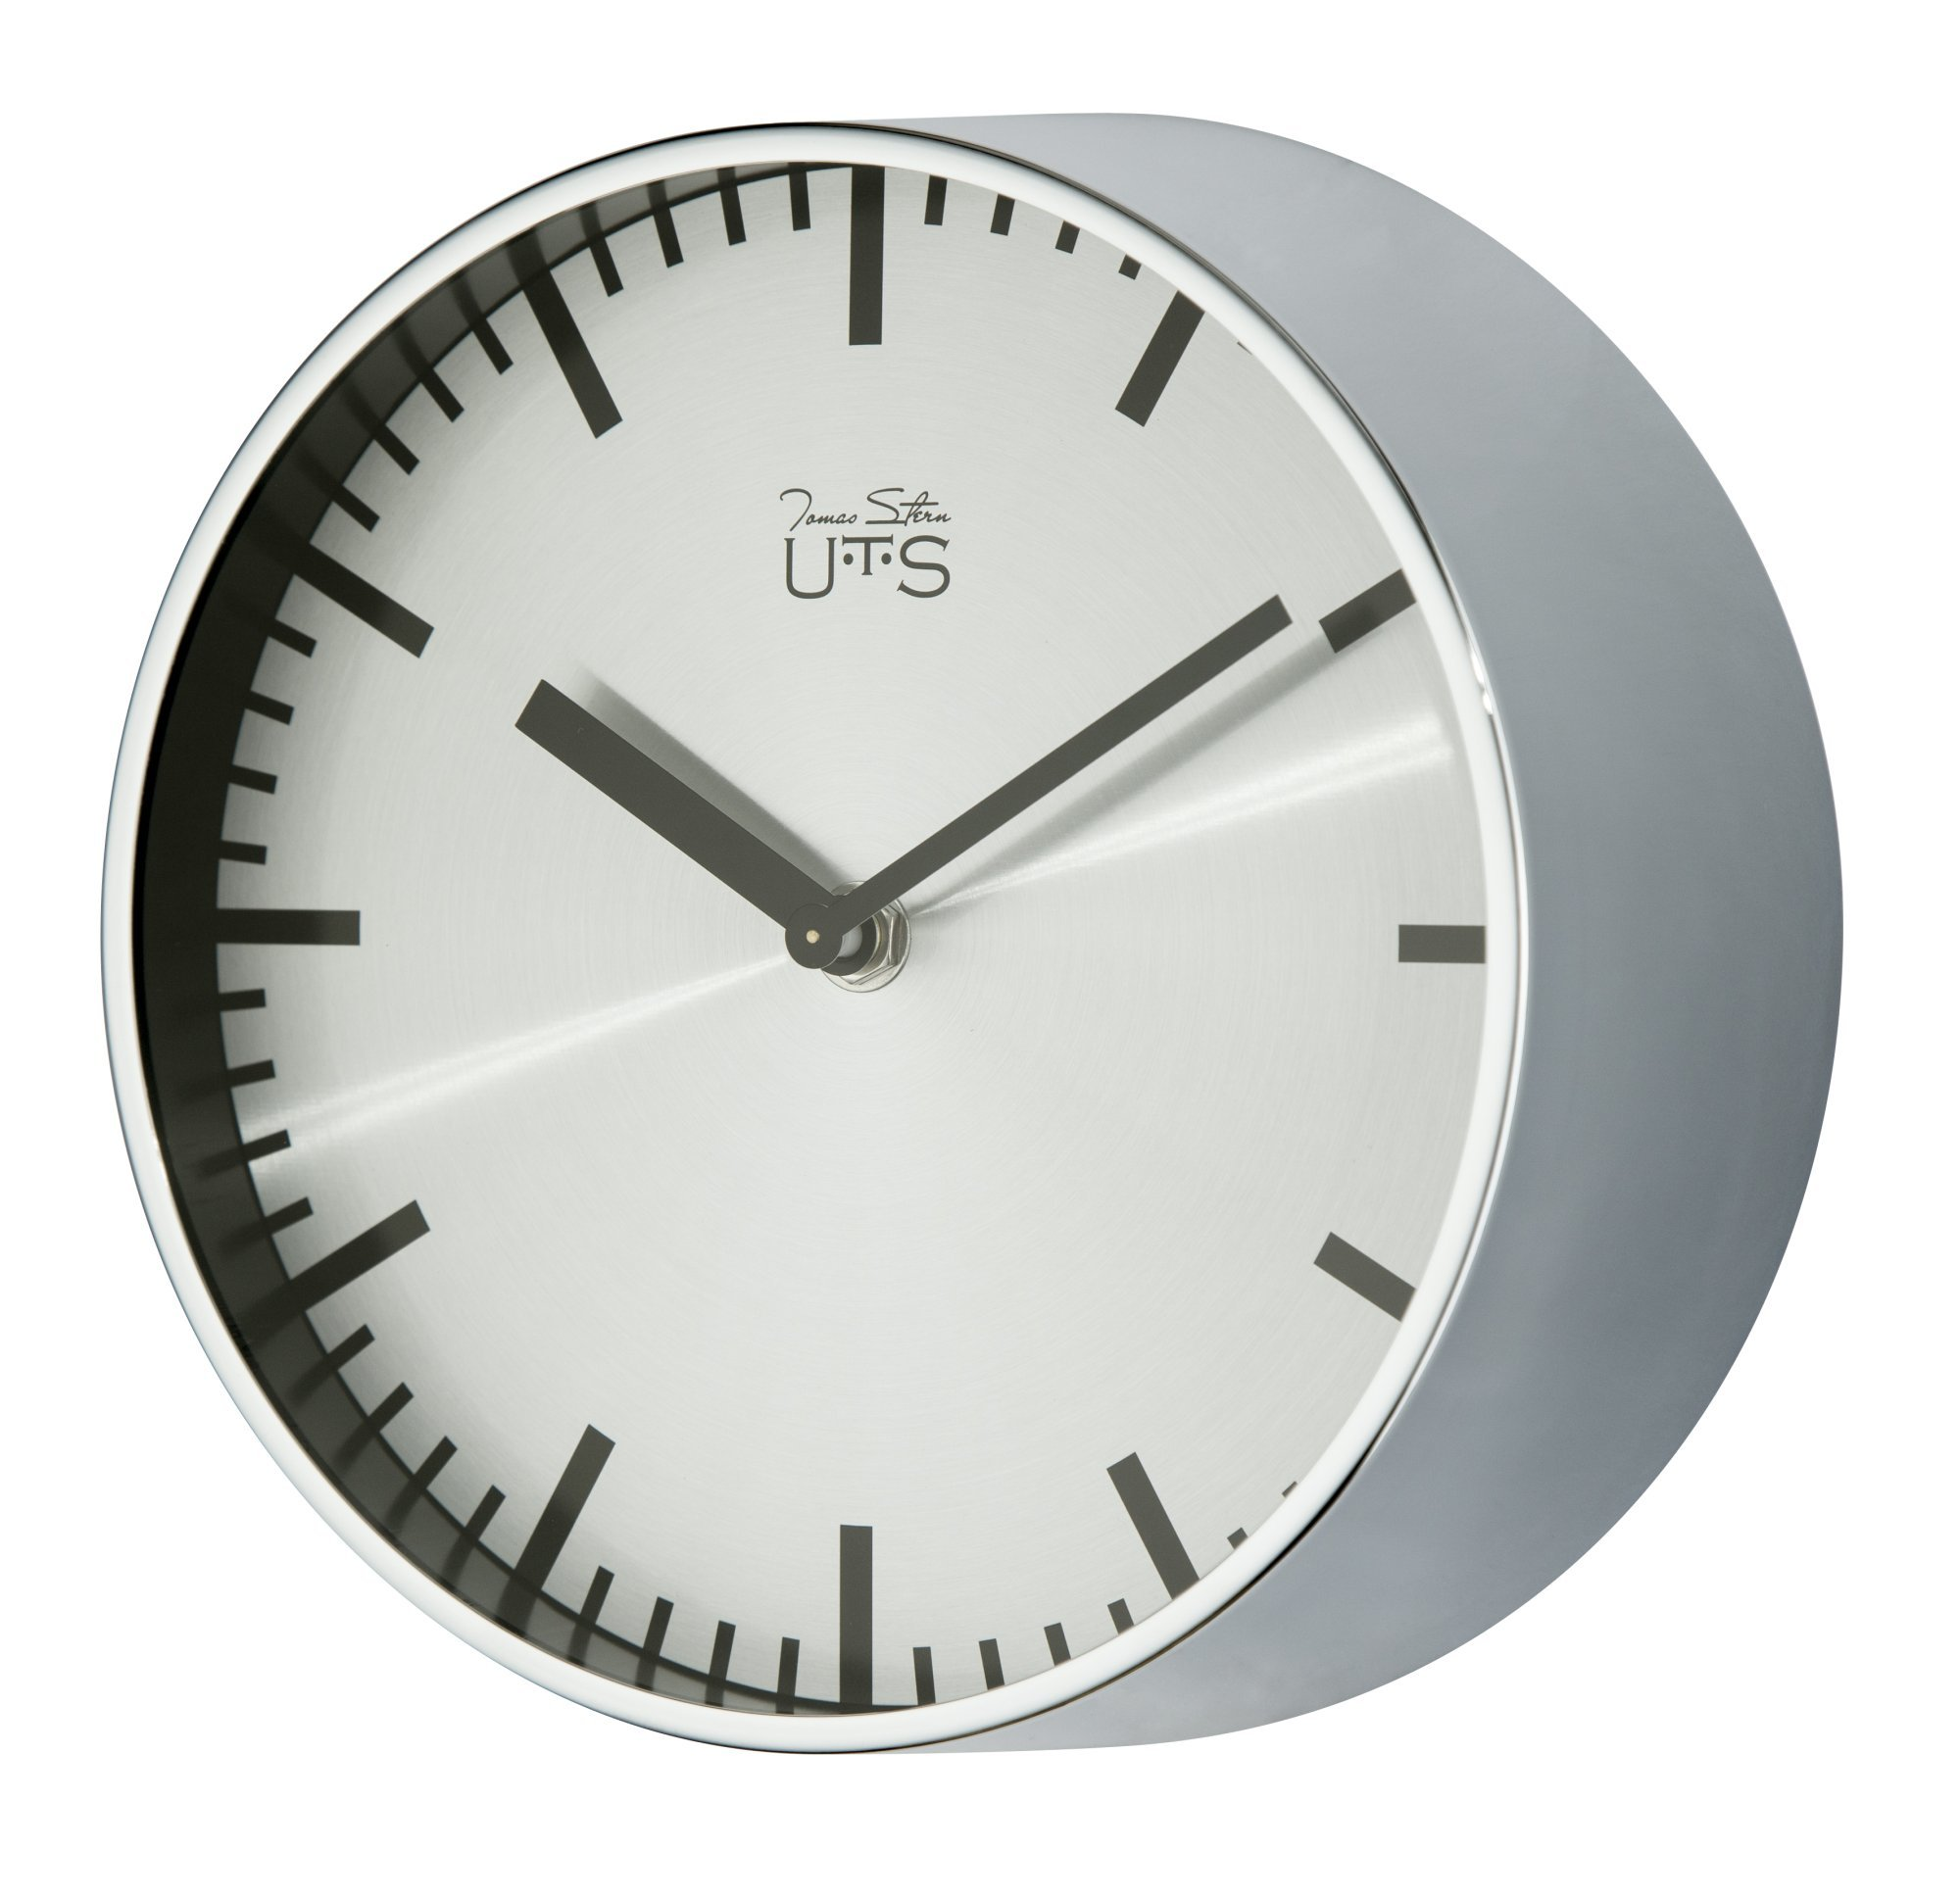 Часы настенные Часы настенные Tomas Stern 4017S chasy-nastennye-tomas-stern-4017s-germaniya.jpg